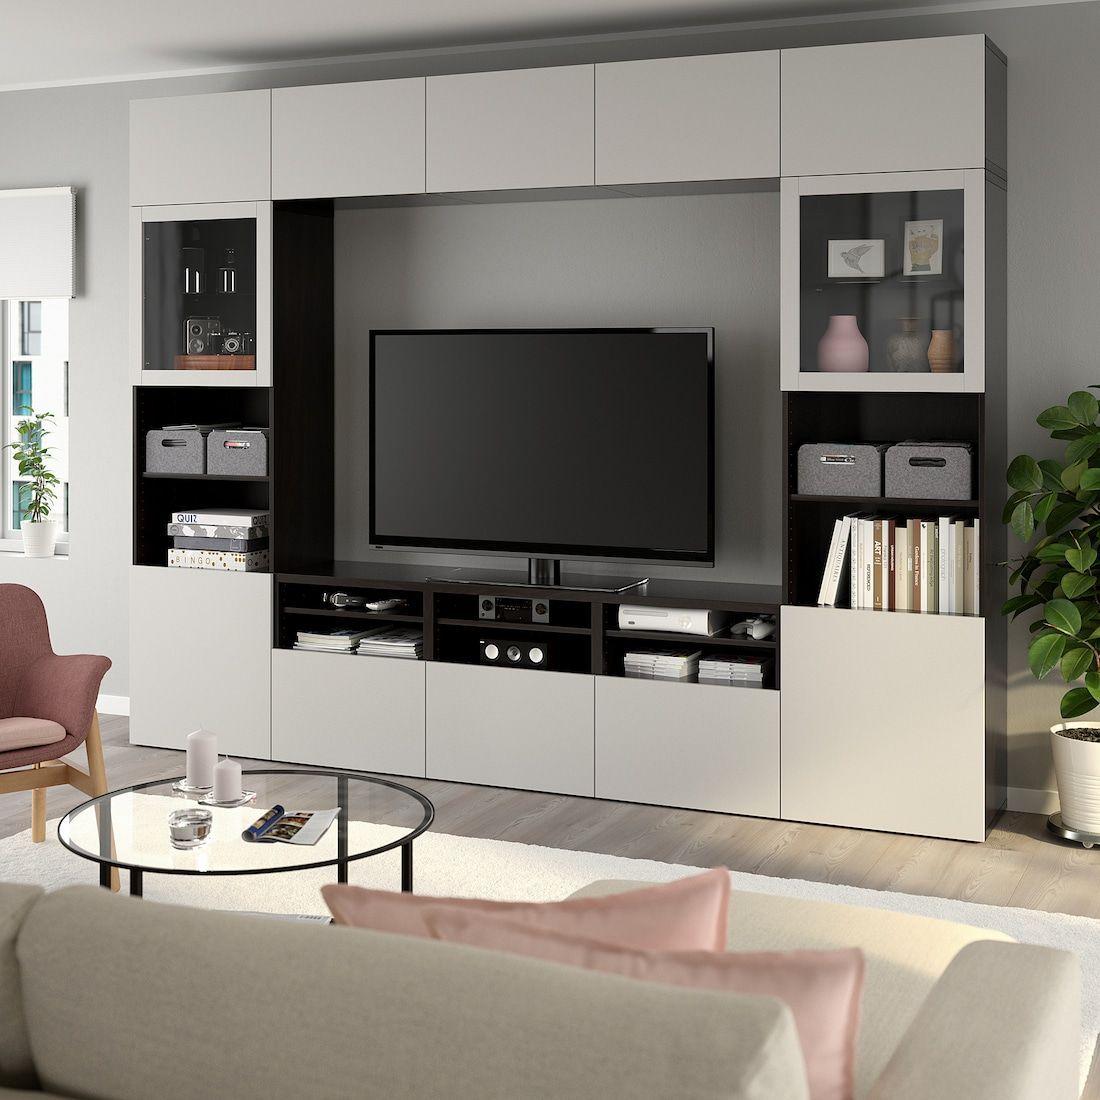 pindaytestals on living room decor  ikea living room